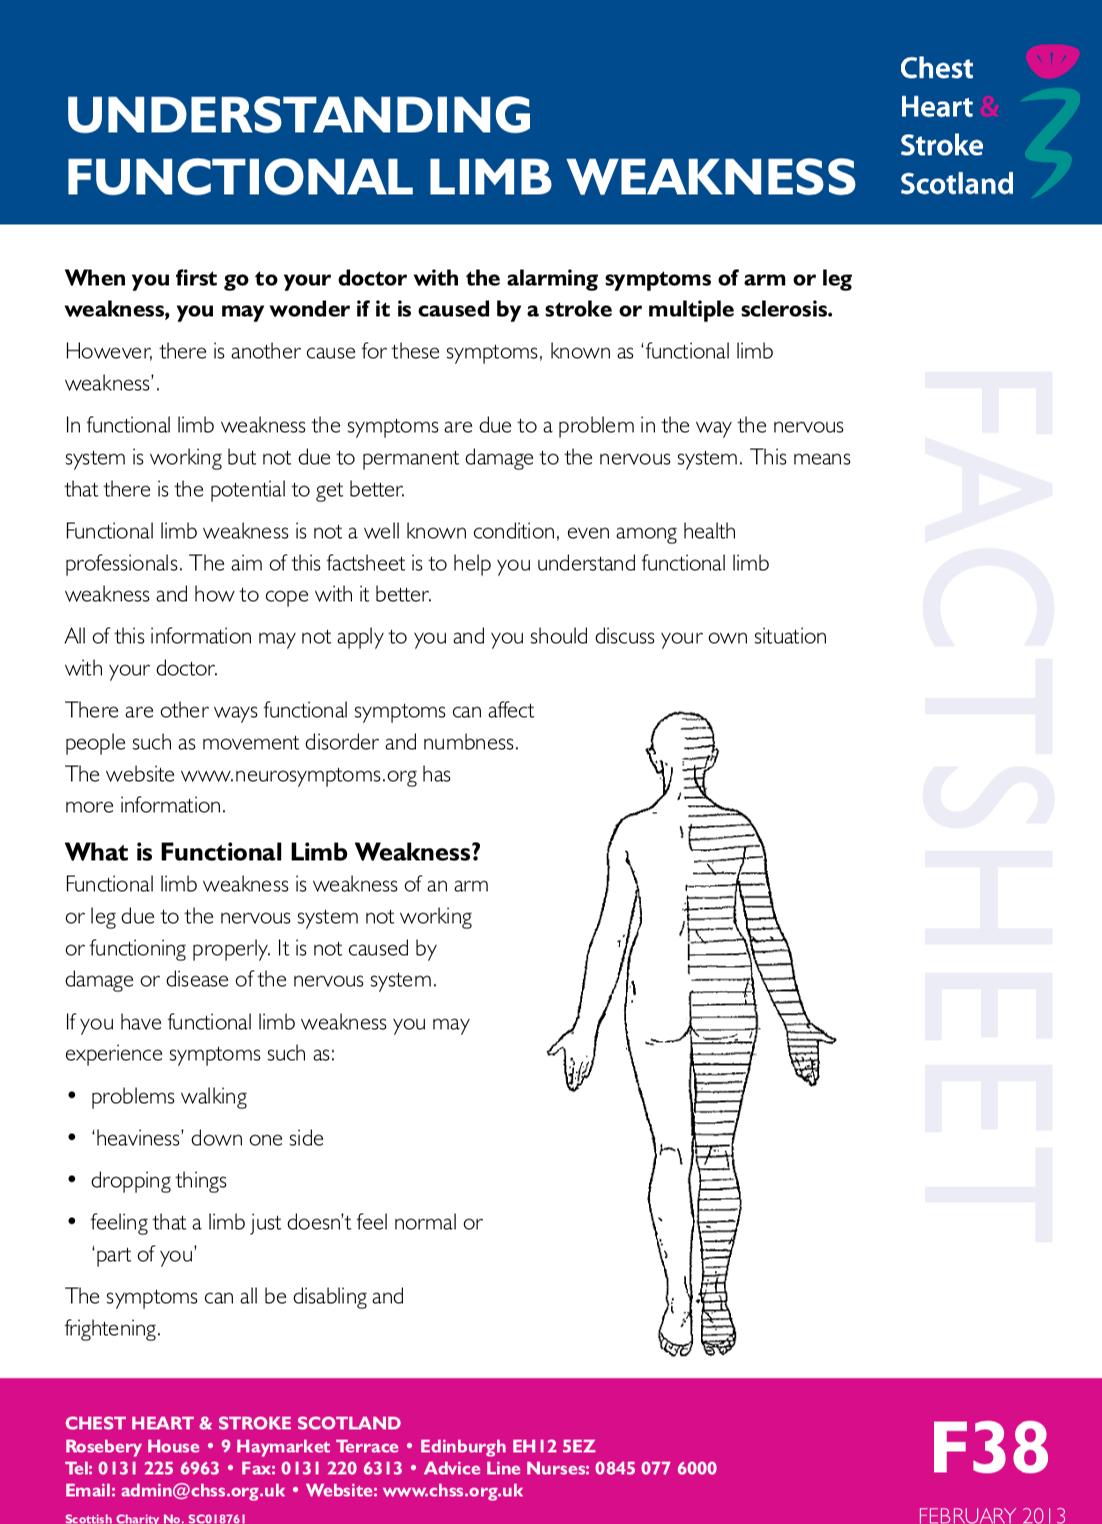 https://ftd.cognihealth.in/wp-content/uploads/2020/11/FactSheet.pdf